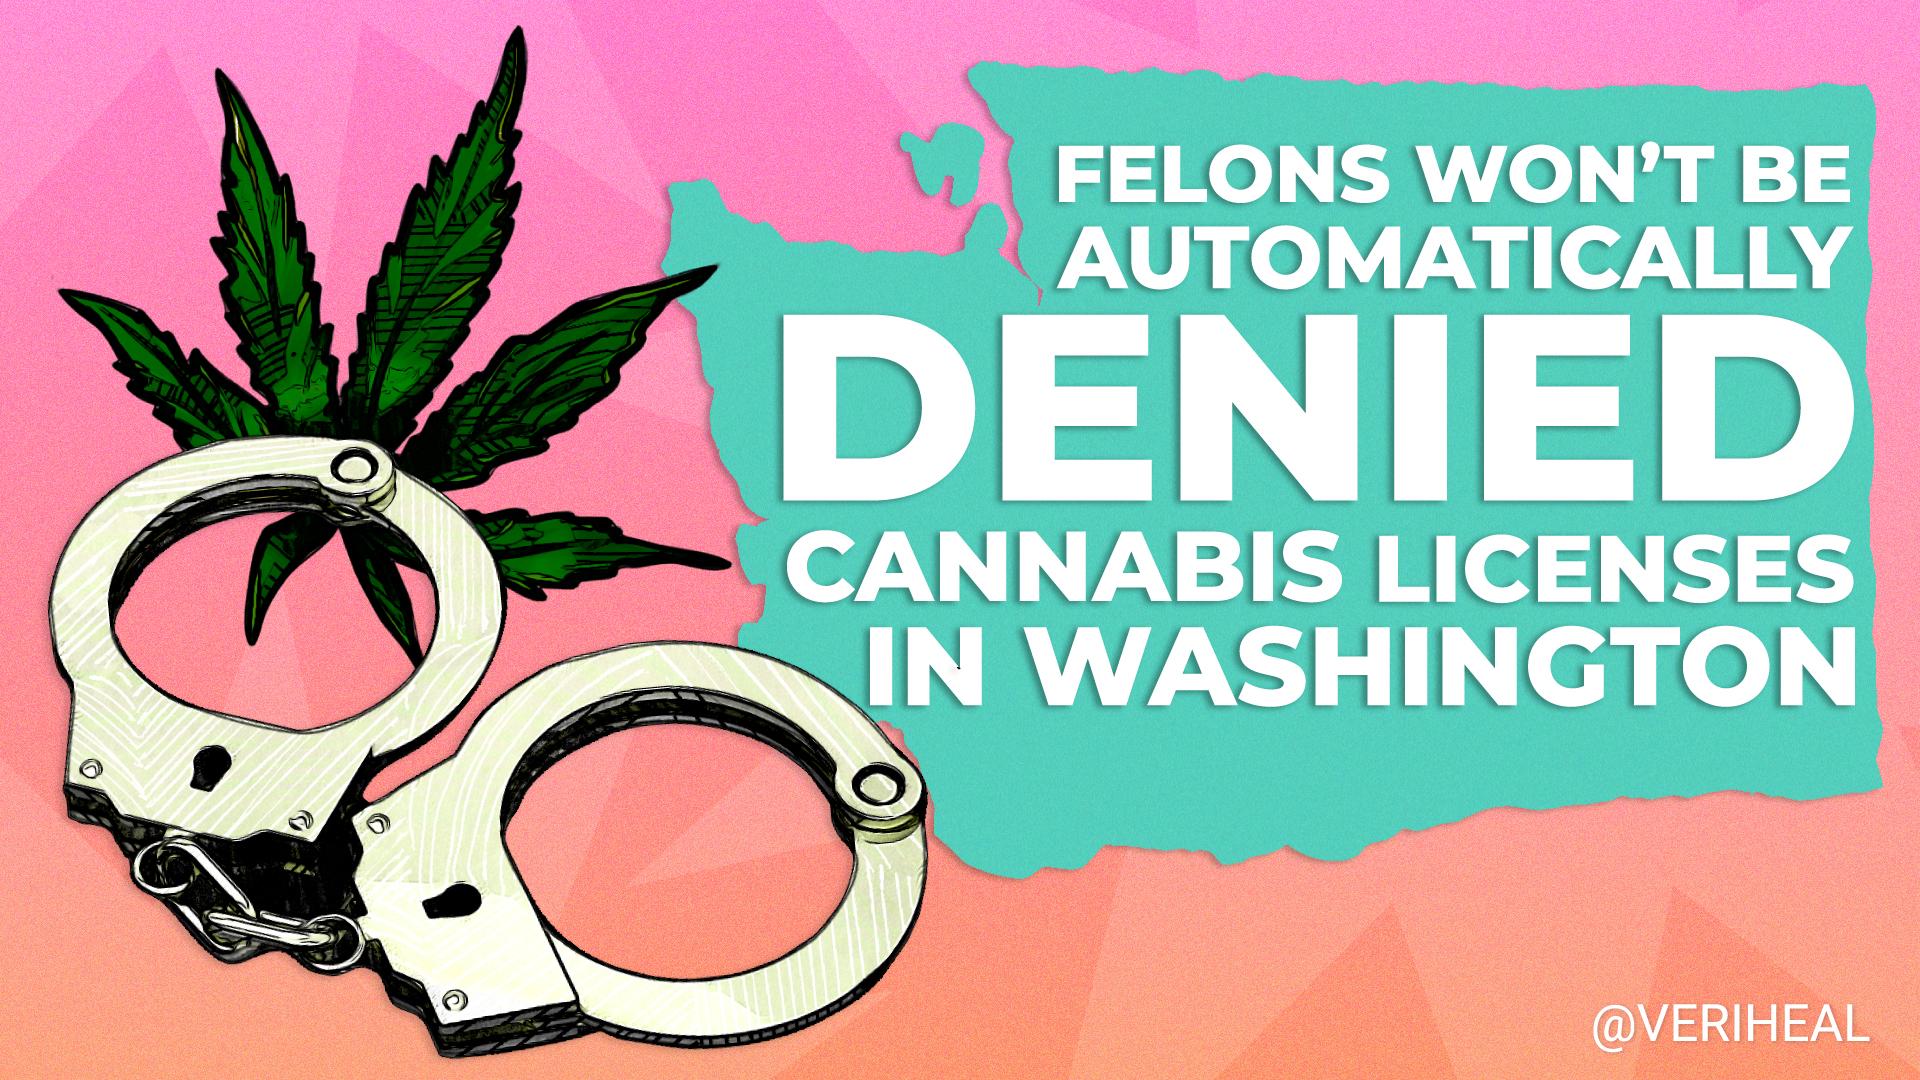 WA Loosens Criminal Background Checks for Cannabis License Applicants